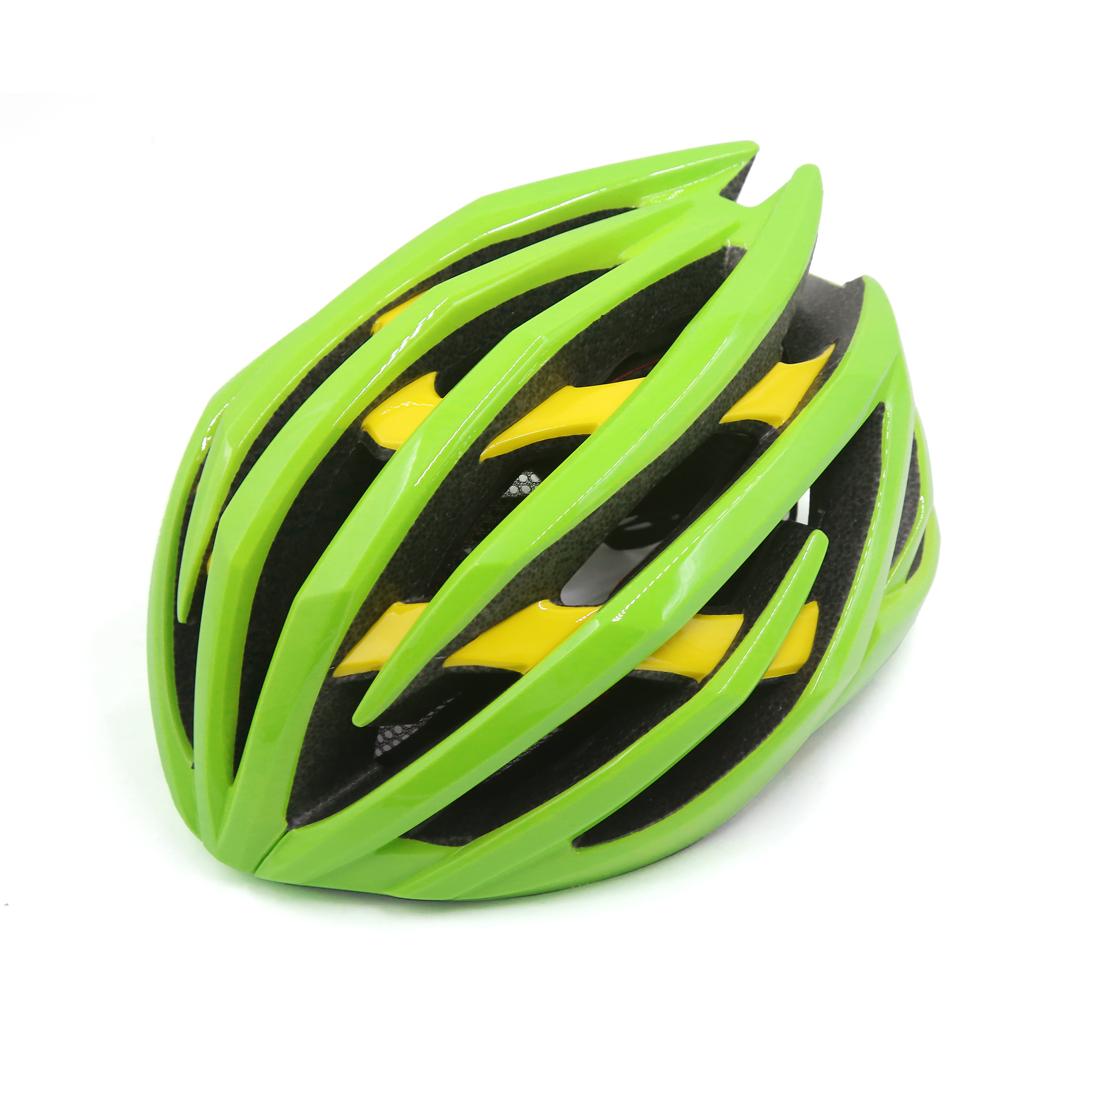 Green Yellow Shockproof Ultralight Integrally Molded EPS Mountain Bike Helmet